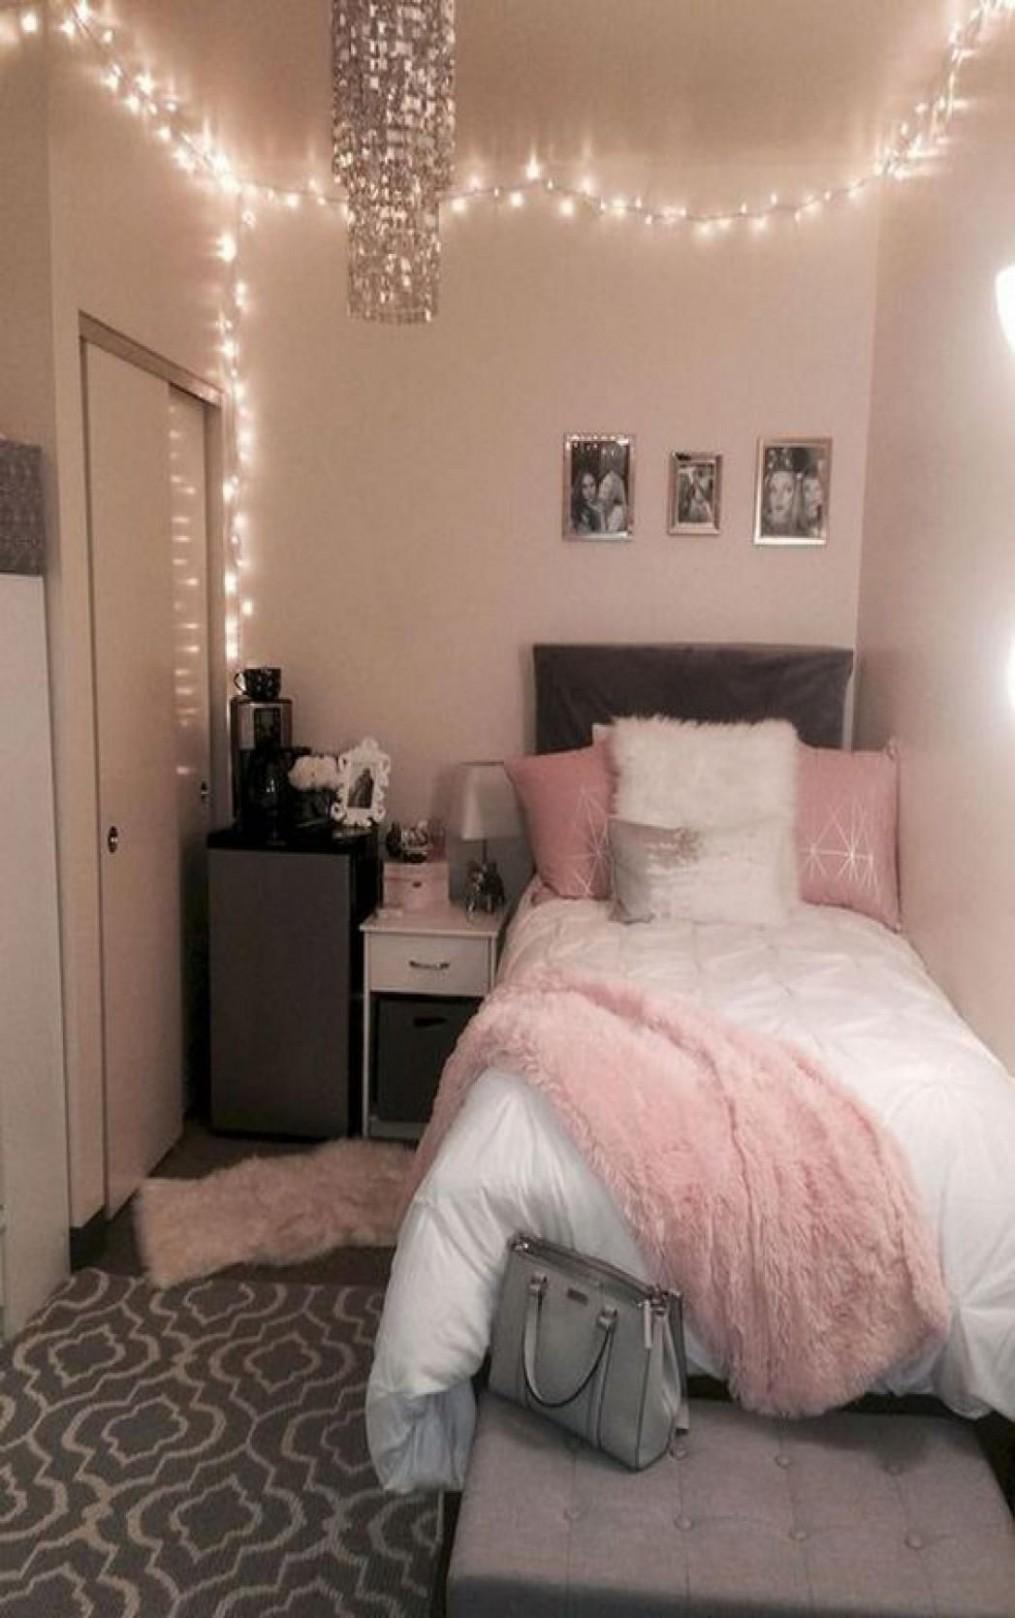 12 Most Popular Apartment Bedroom Design Ideas in 12  Dorm room  - Bedroom Ideas Apartment